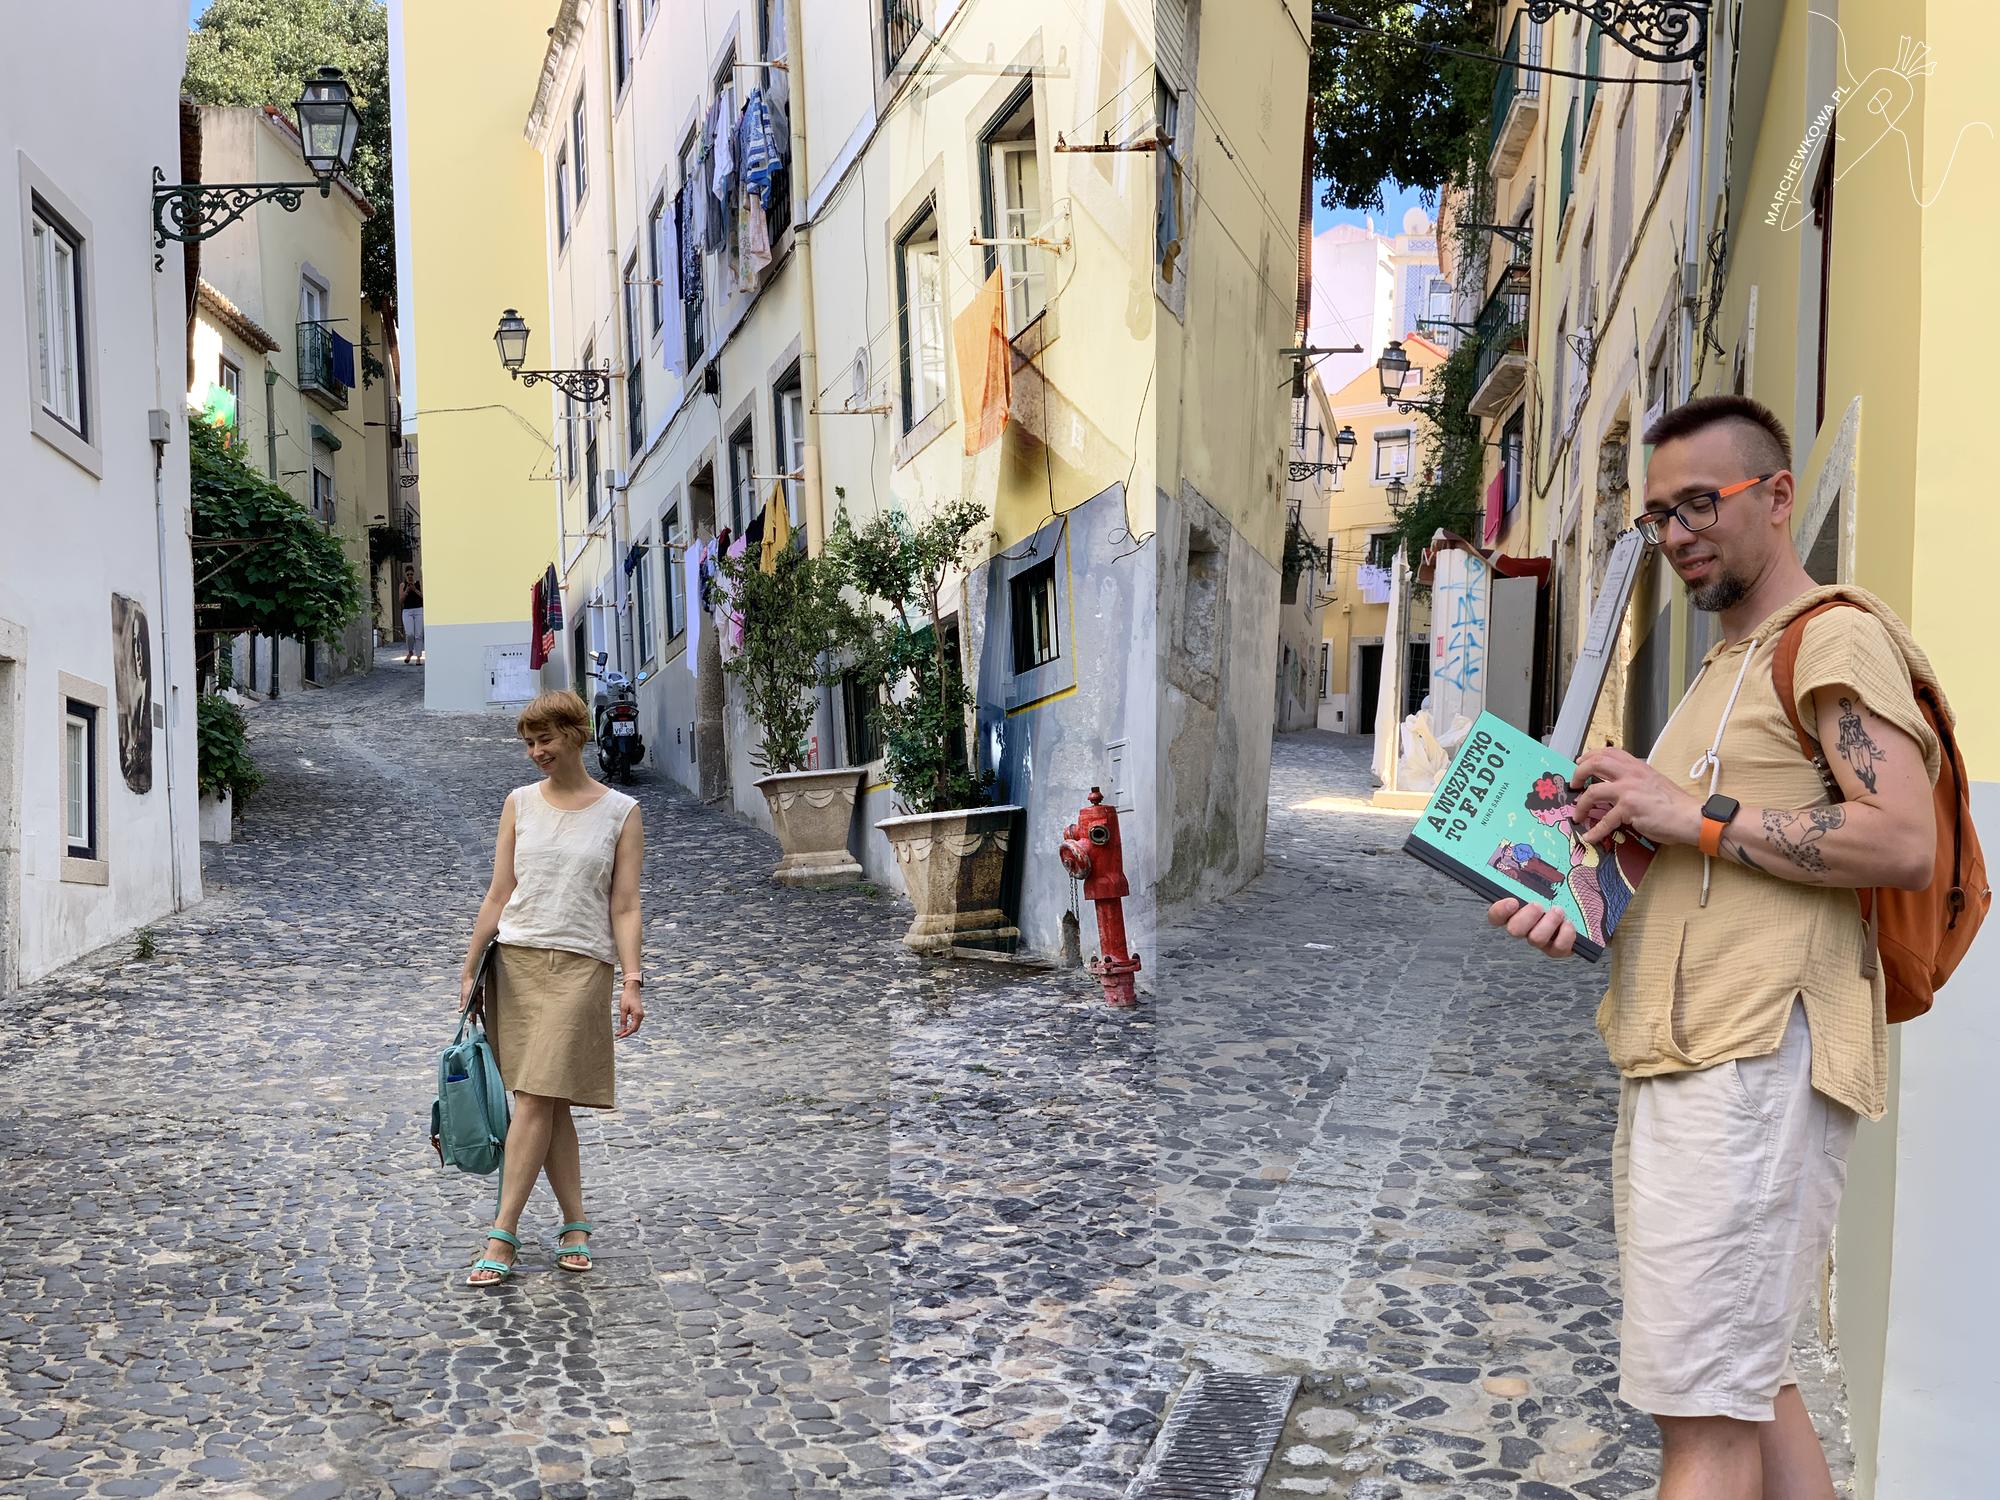 marchewkowa, blog, podróże, urlop, wakacje, Portugalia, Lizbona, Mouraria, fado, travel, Lisboa, Nuno Saraiva, fado